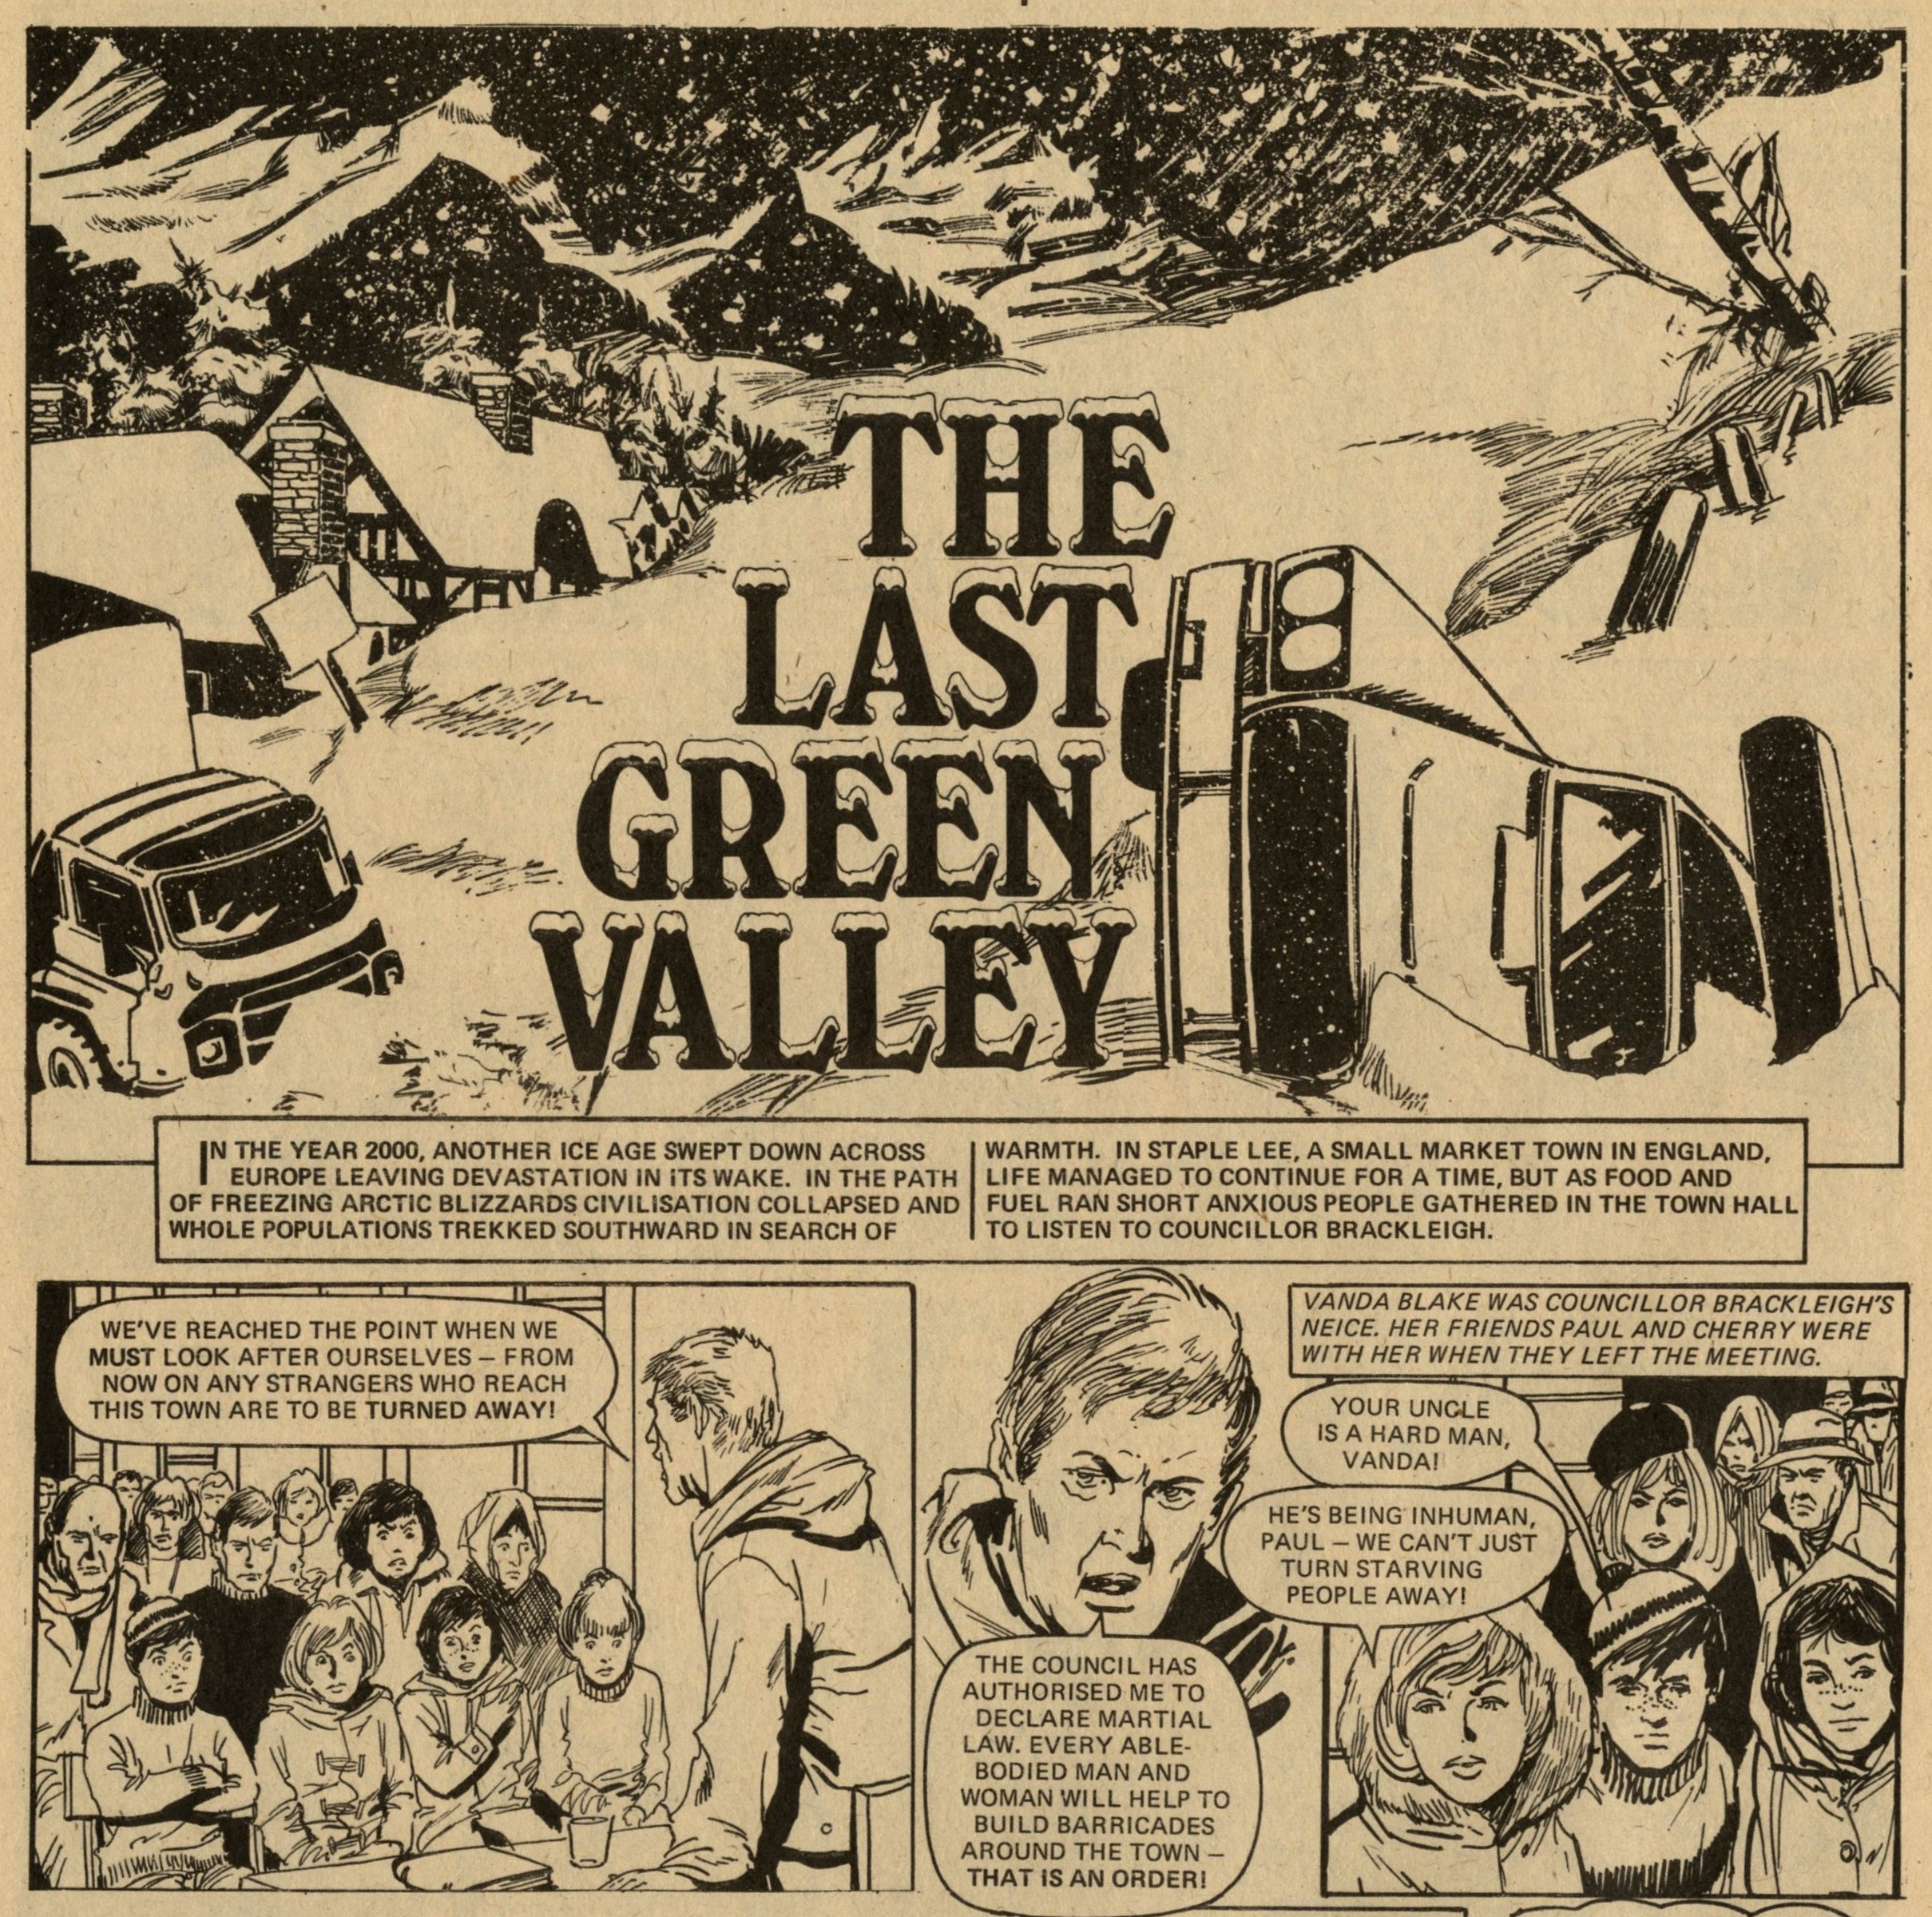 The Last Green Valley: artist unknown